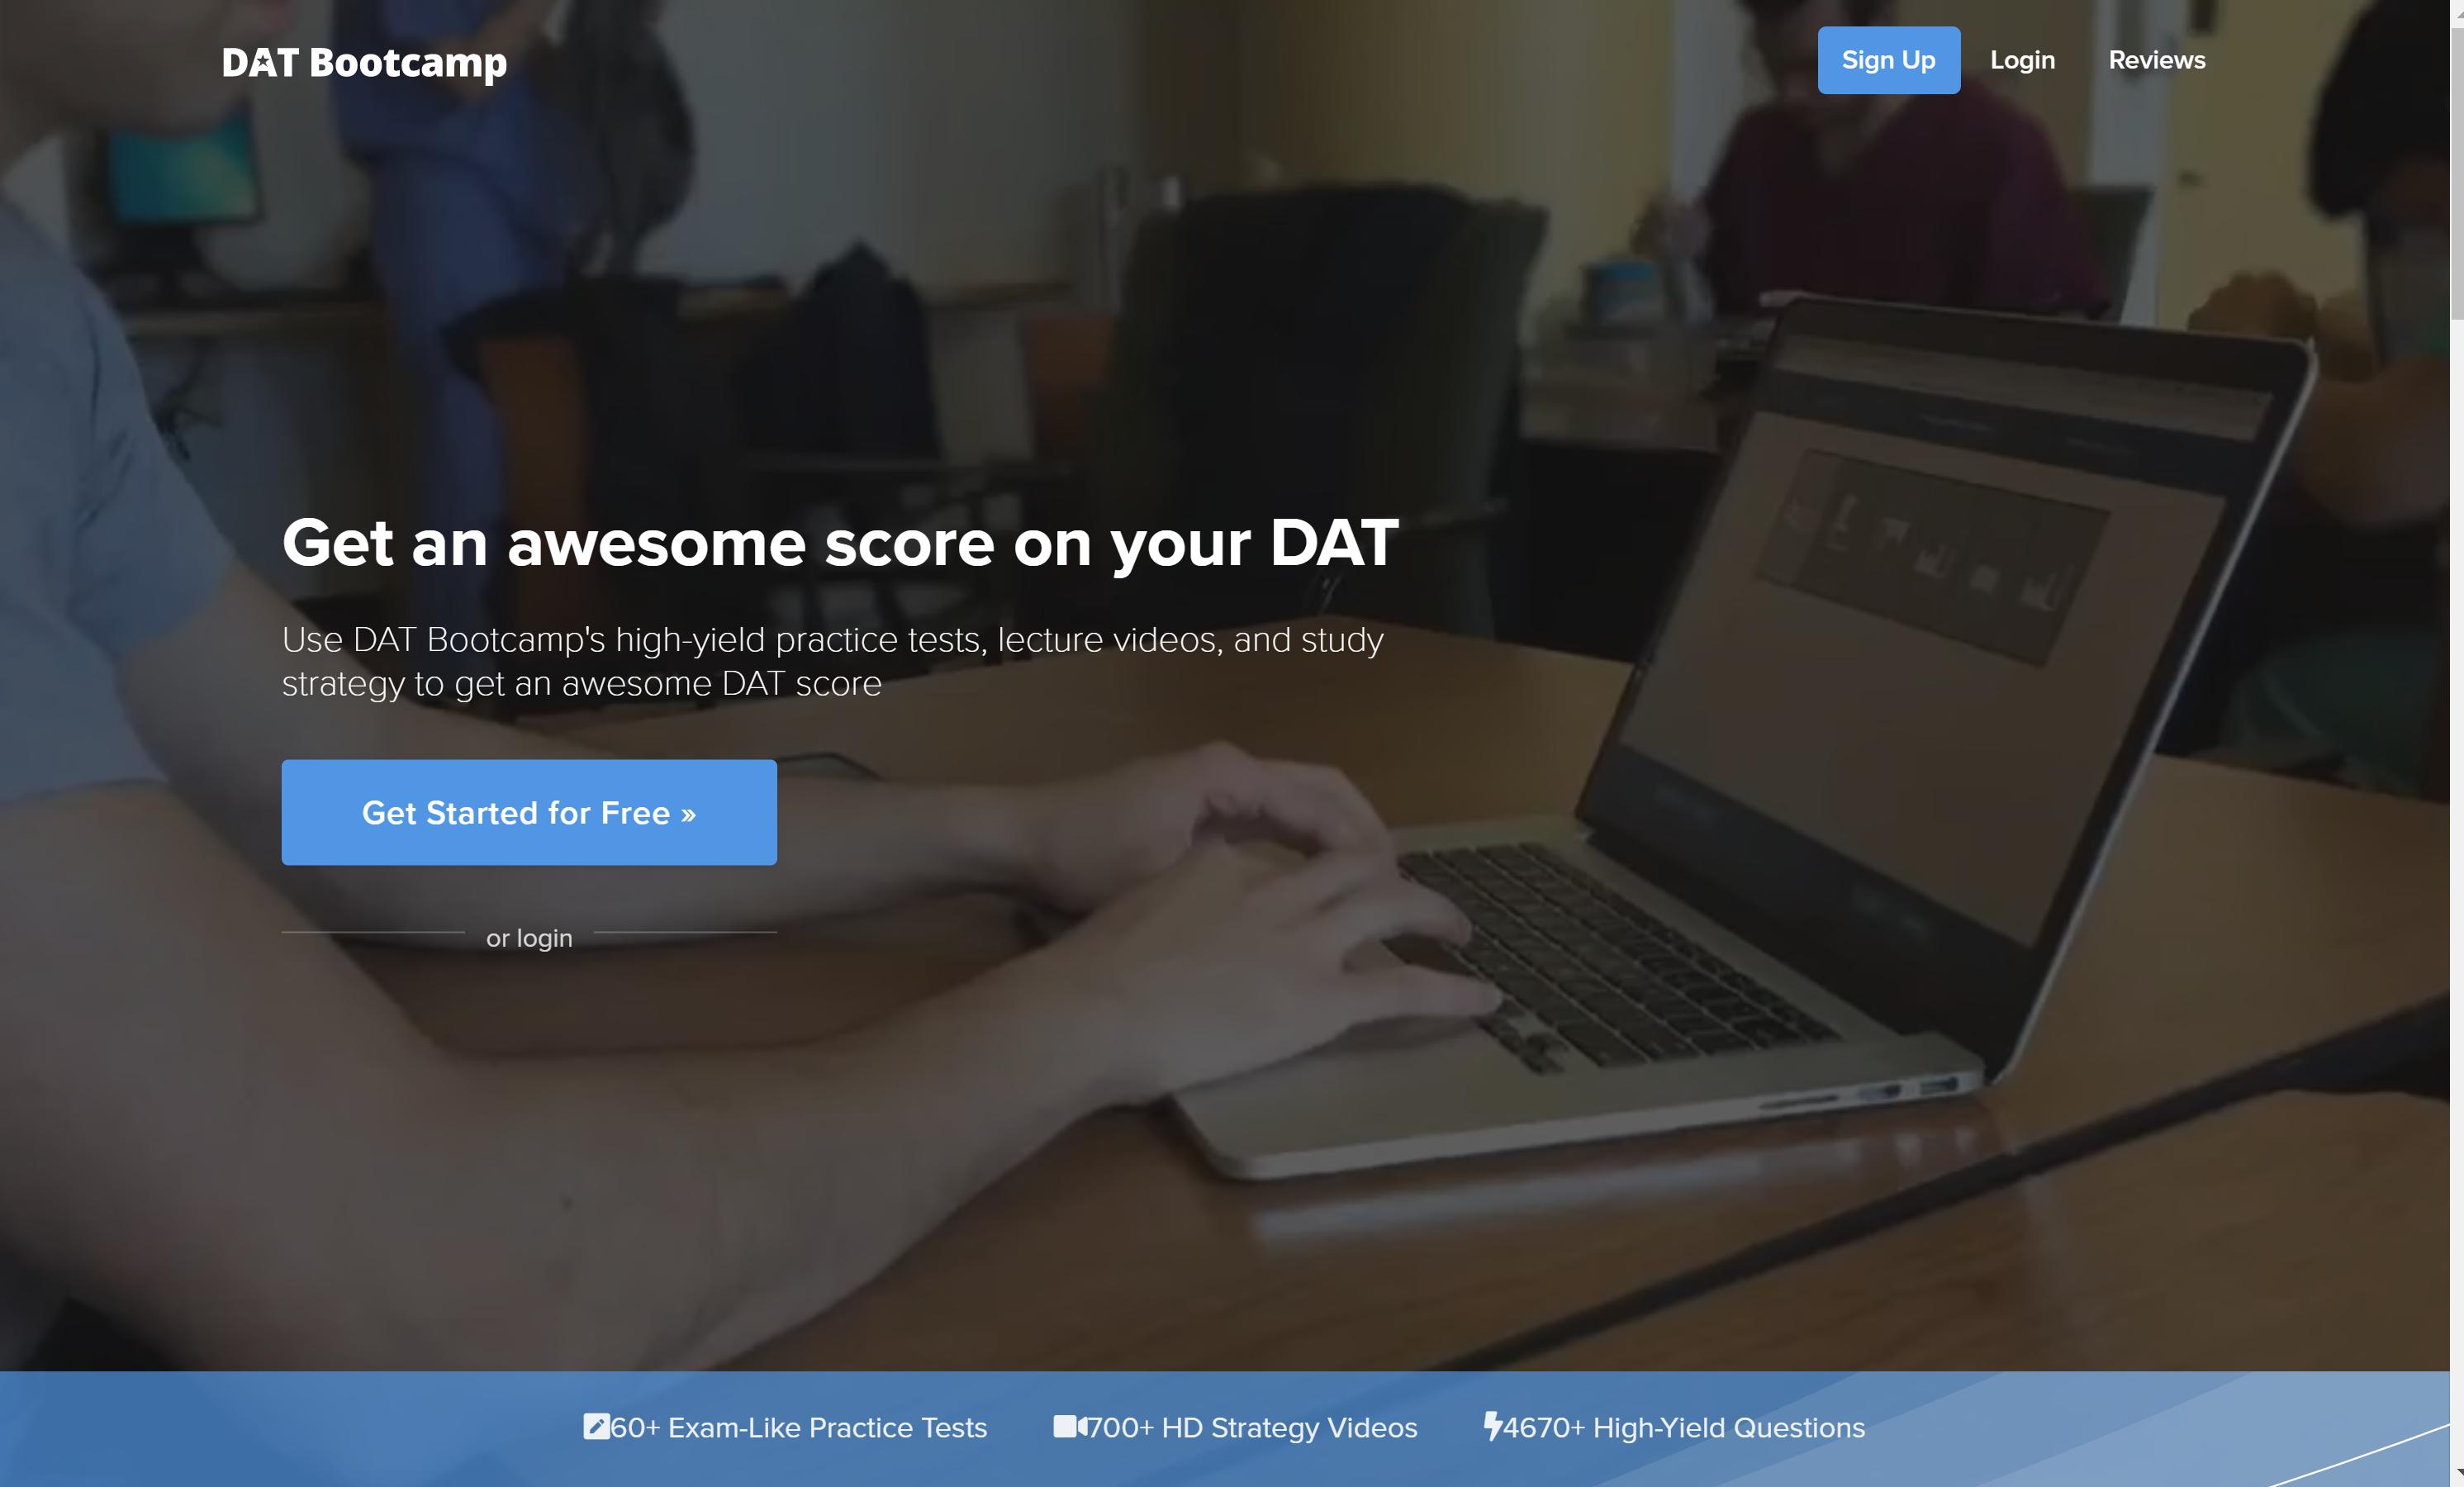 DAT Bootcamp The Best Online DAT Preparation